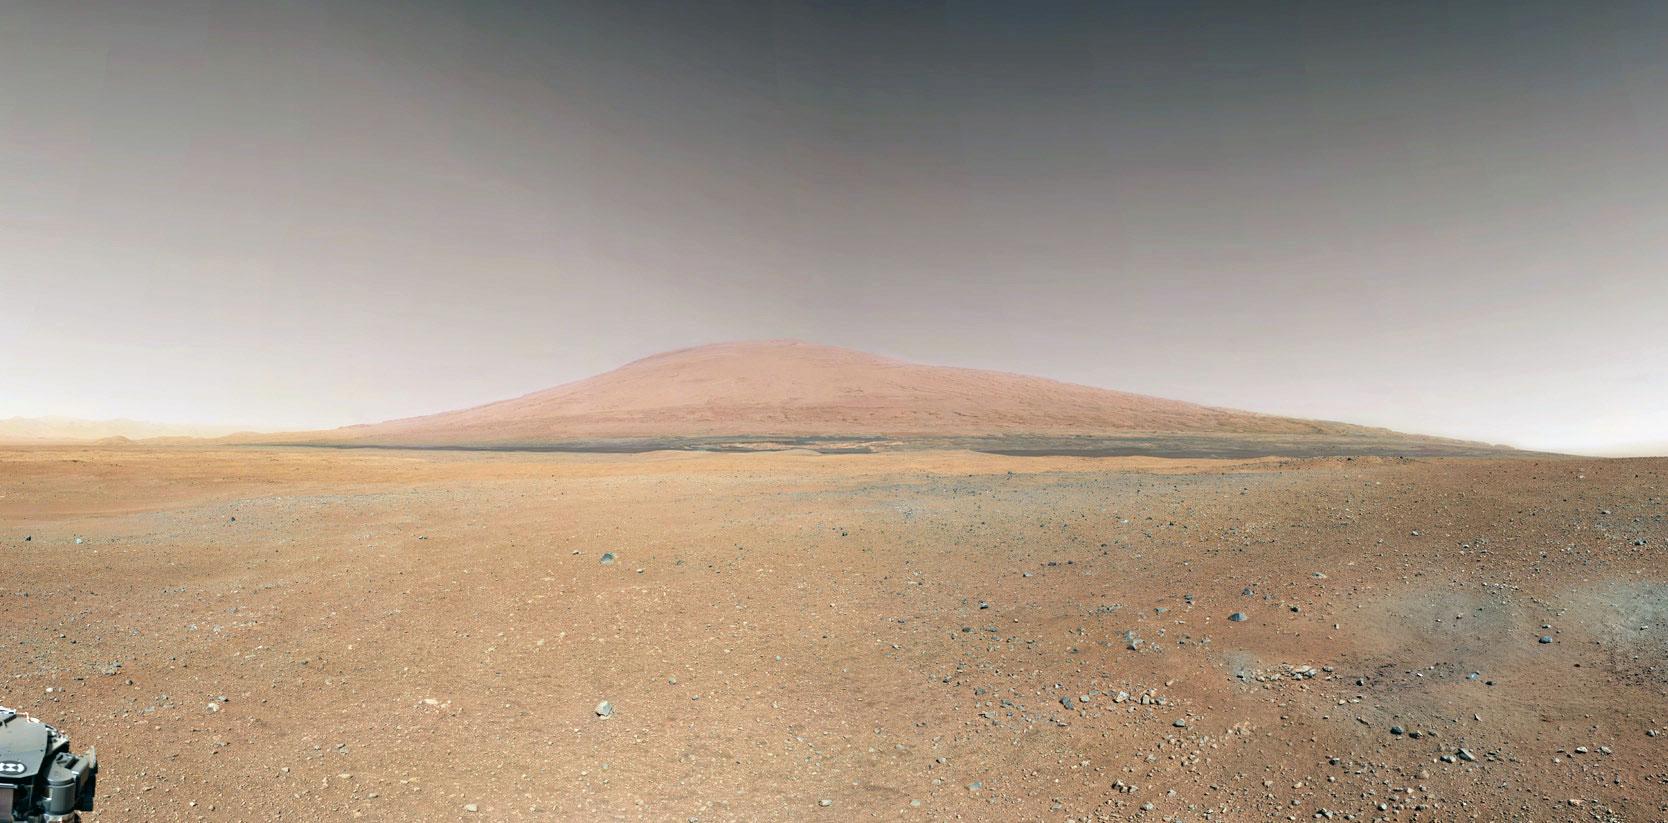 mt-sharp-in-gale-crater-curiosity-bradbury-landing.jpg